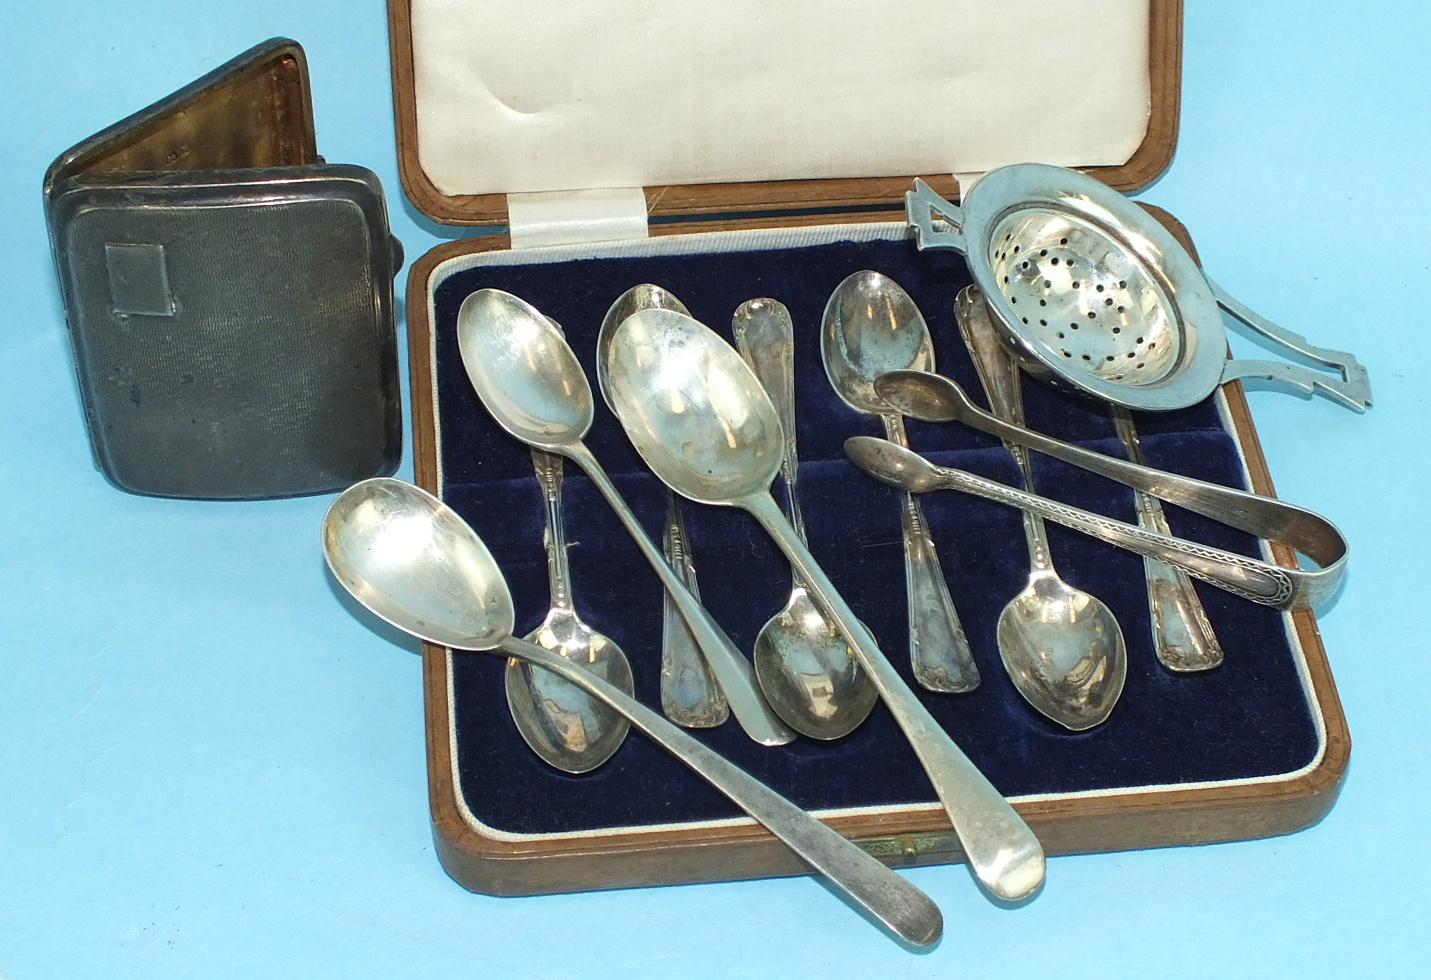 Lot 462 - Six cased silver teaspoons, Sheffield 192........., a ladies cigarette case, 8 x 6cm, Chester